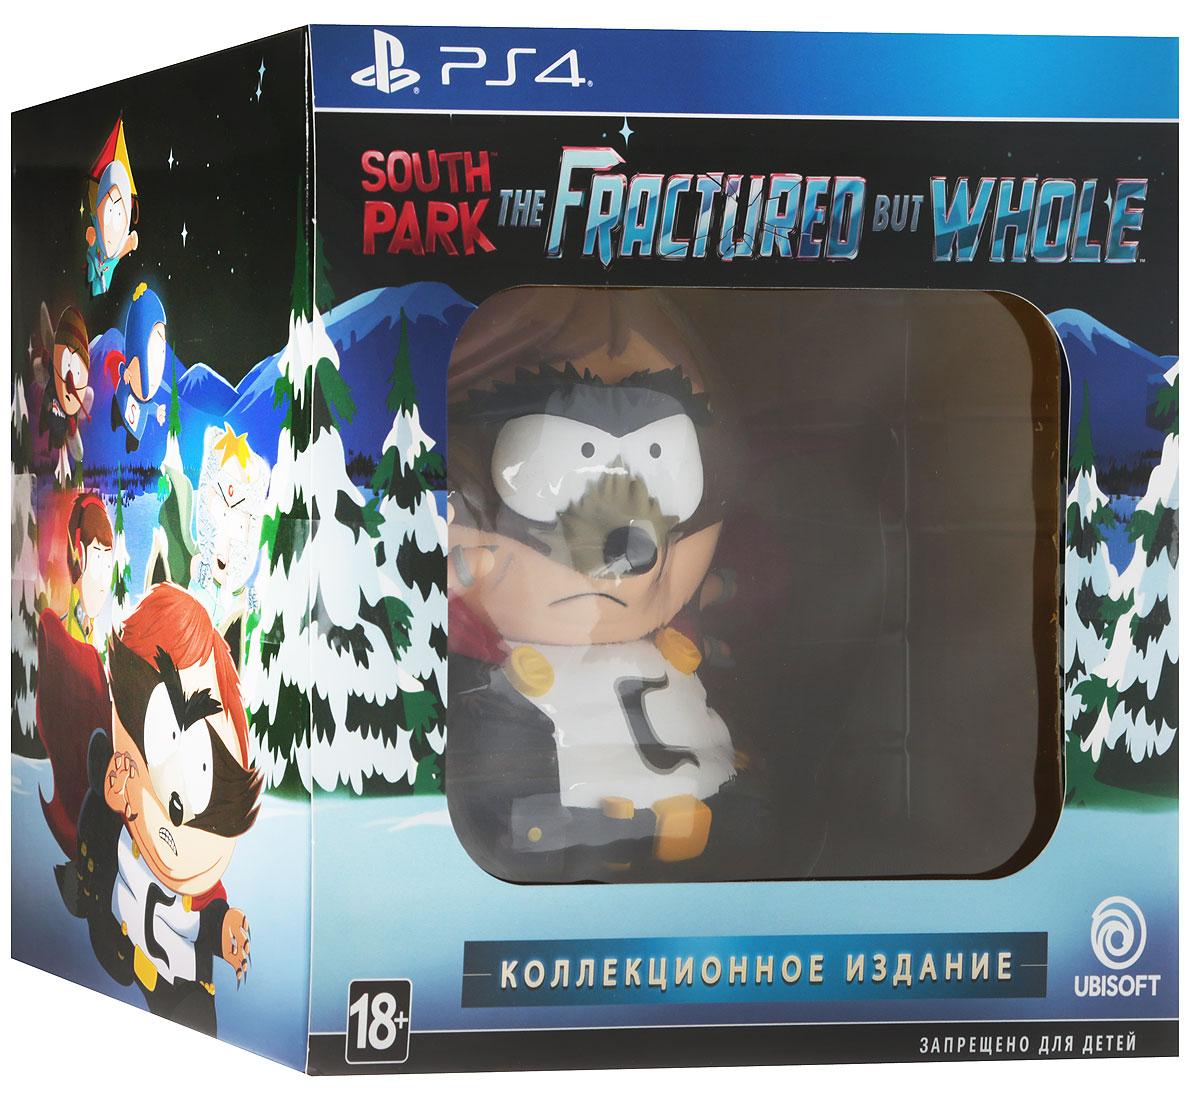 South Park: The Fractured but Whole. Коллекционное издание (PS4)